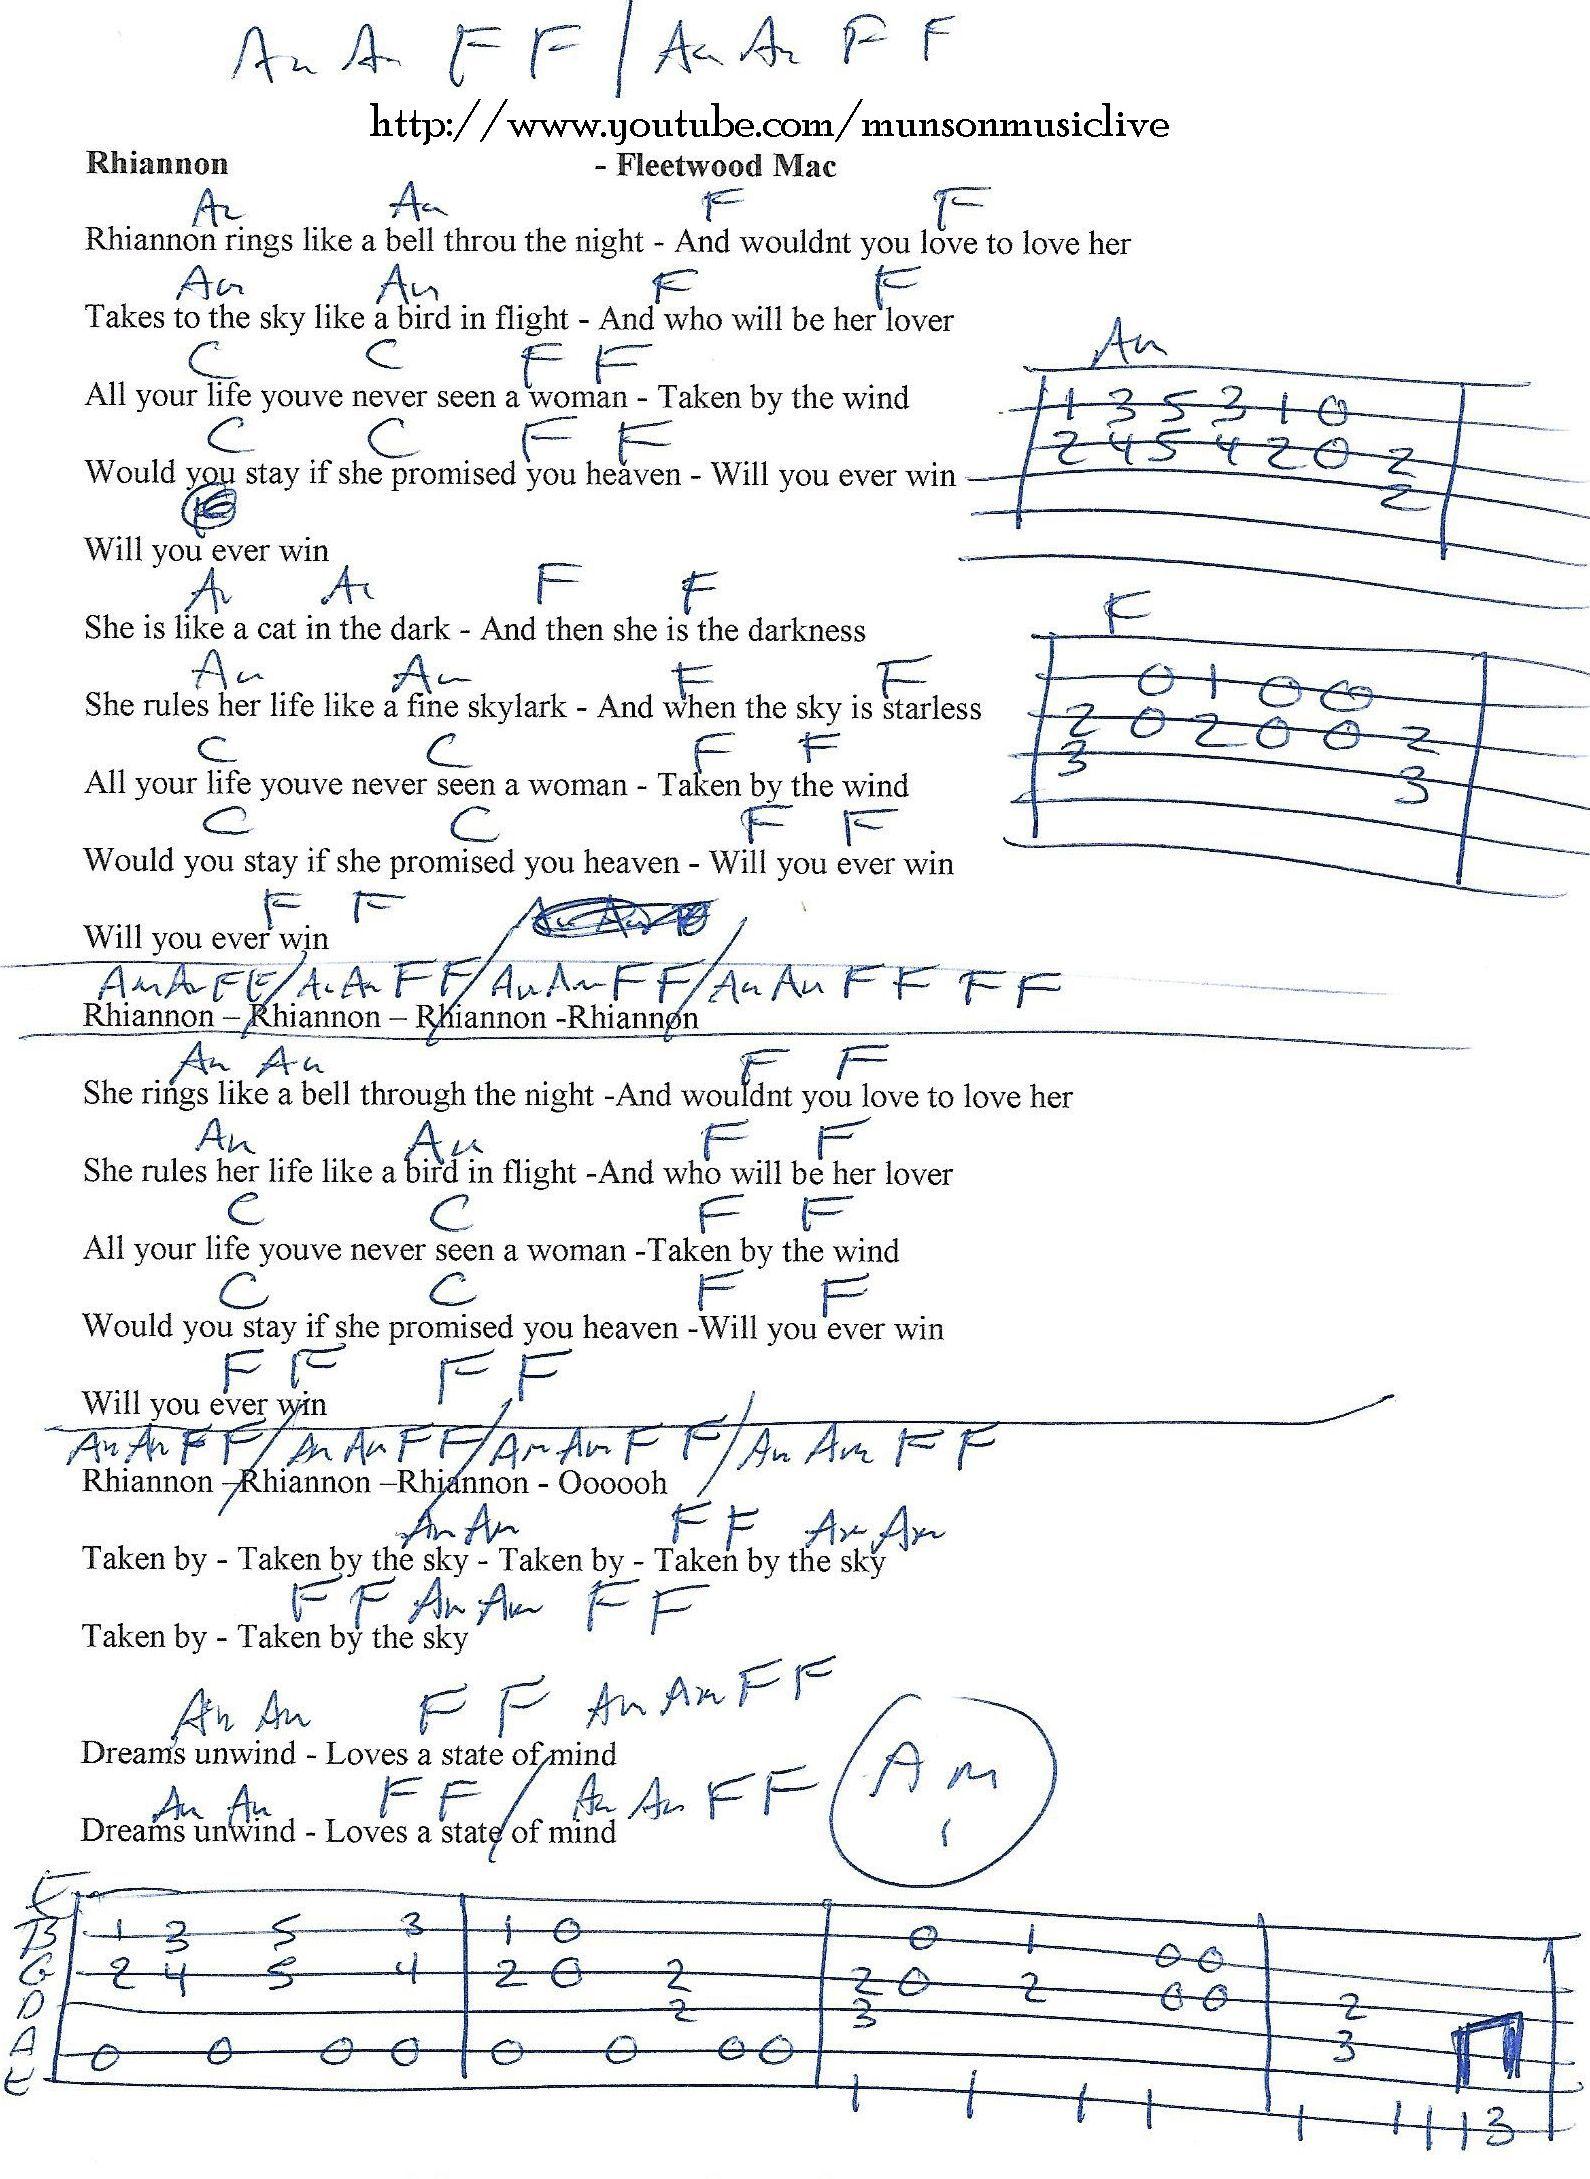 Rhiannon fleetwood mac guitar chord chart singing lessons rhiannon fleetwood mac guitar chord chart hexwebz Images